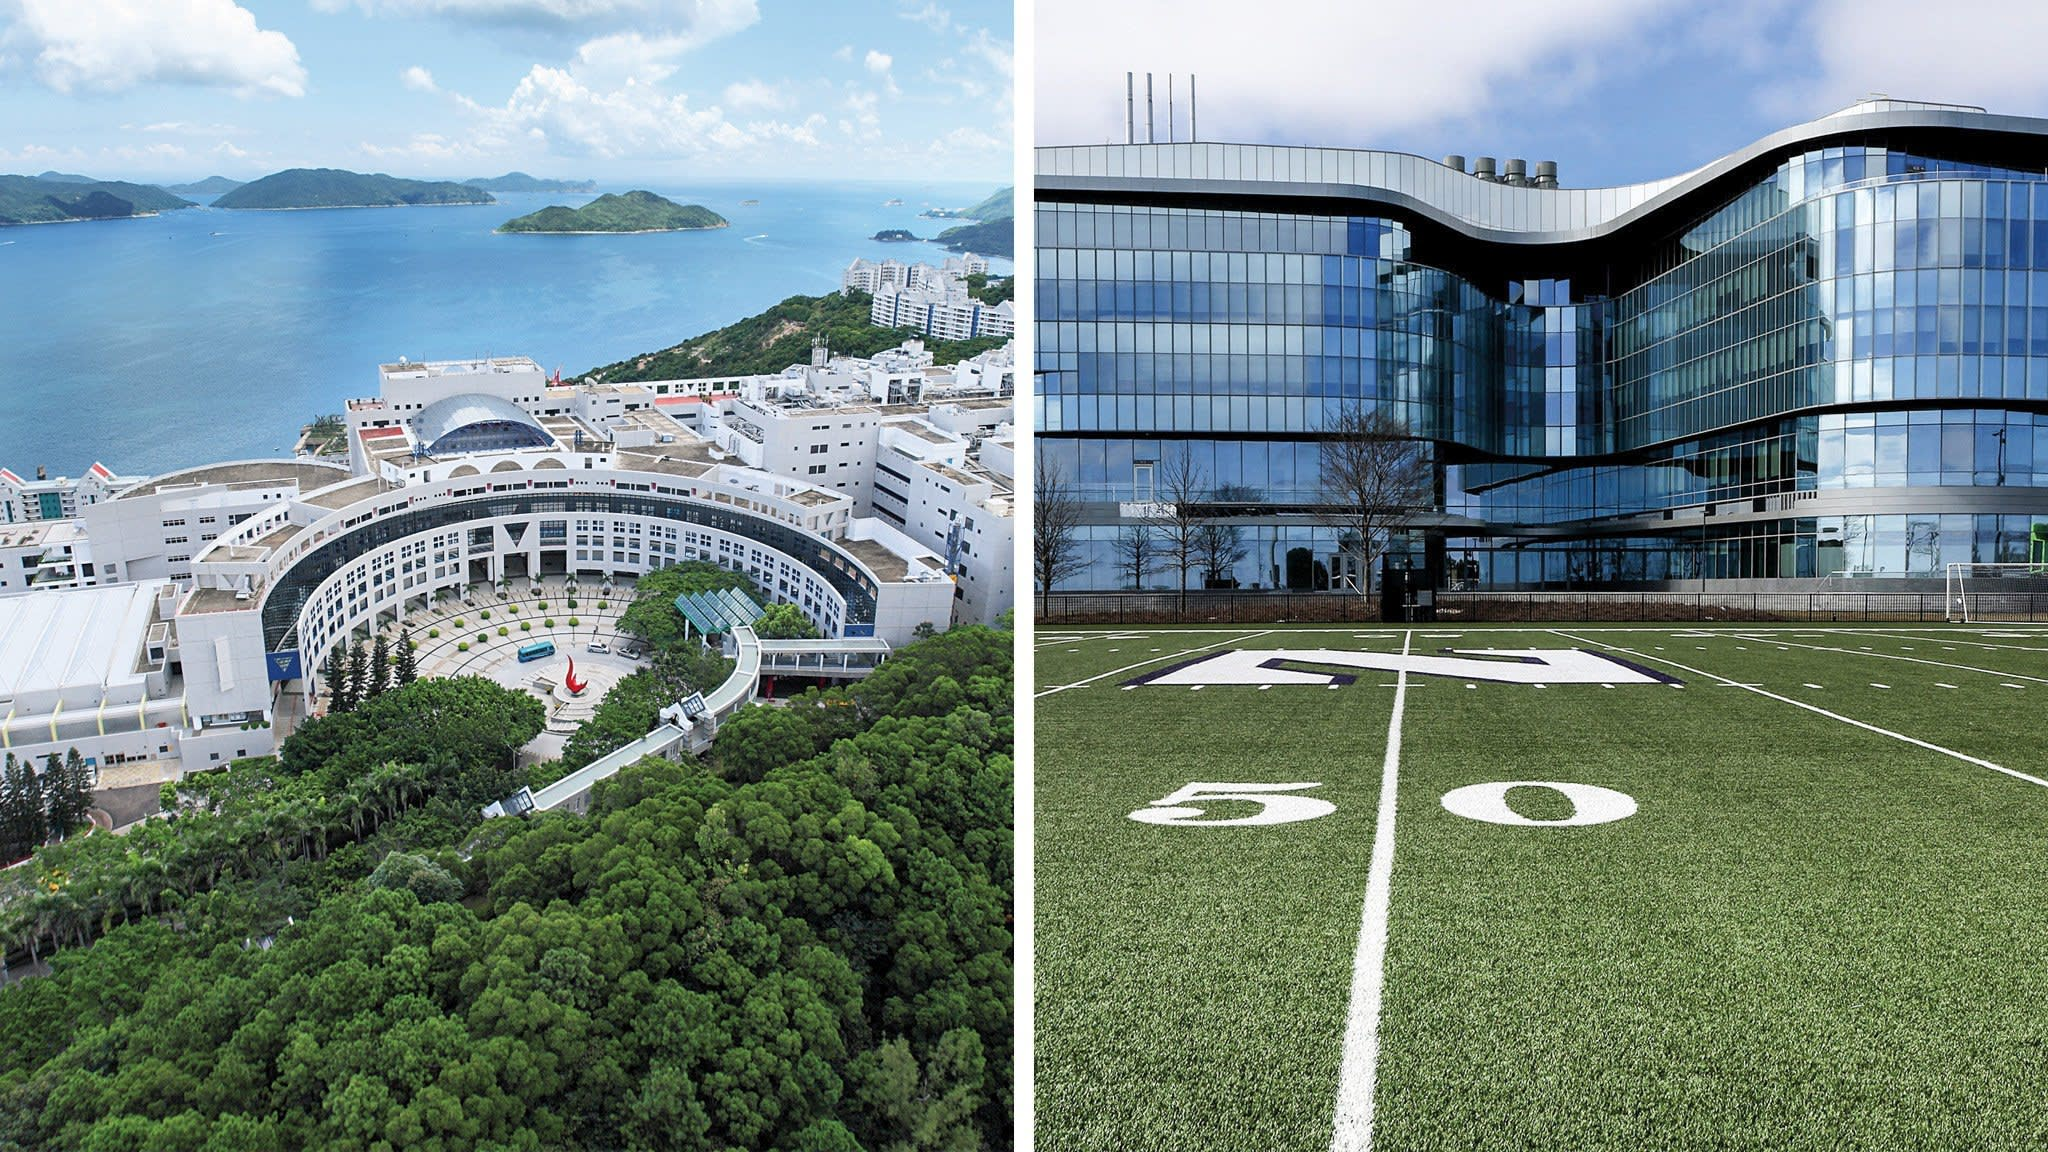 Executive MBA Ranking 2018: ranking and analysis